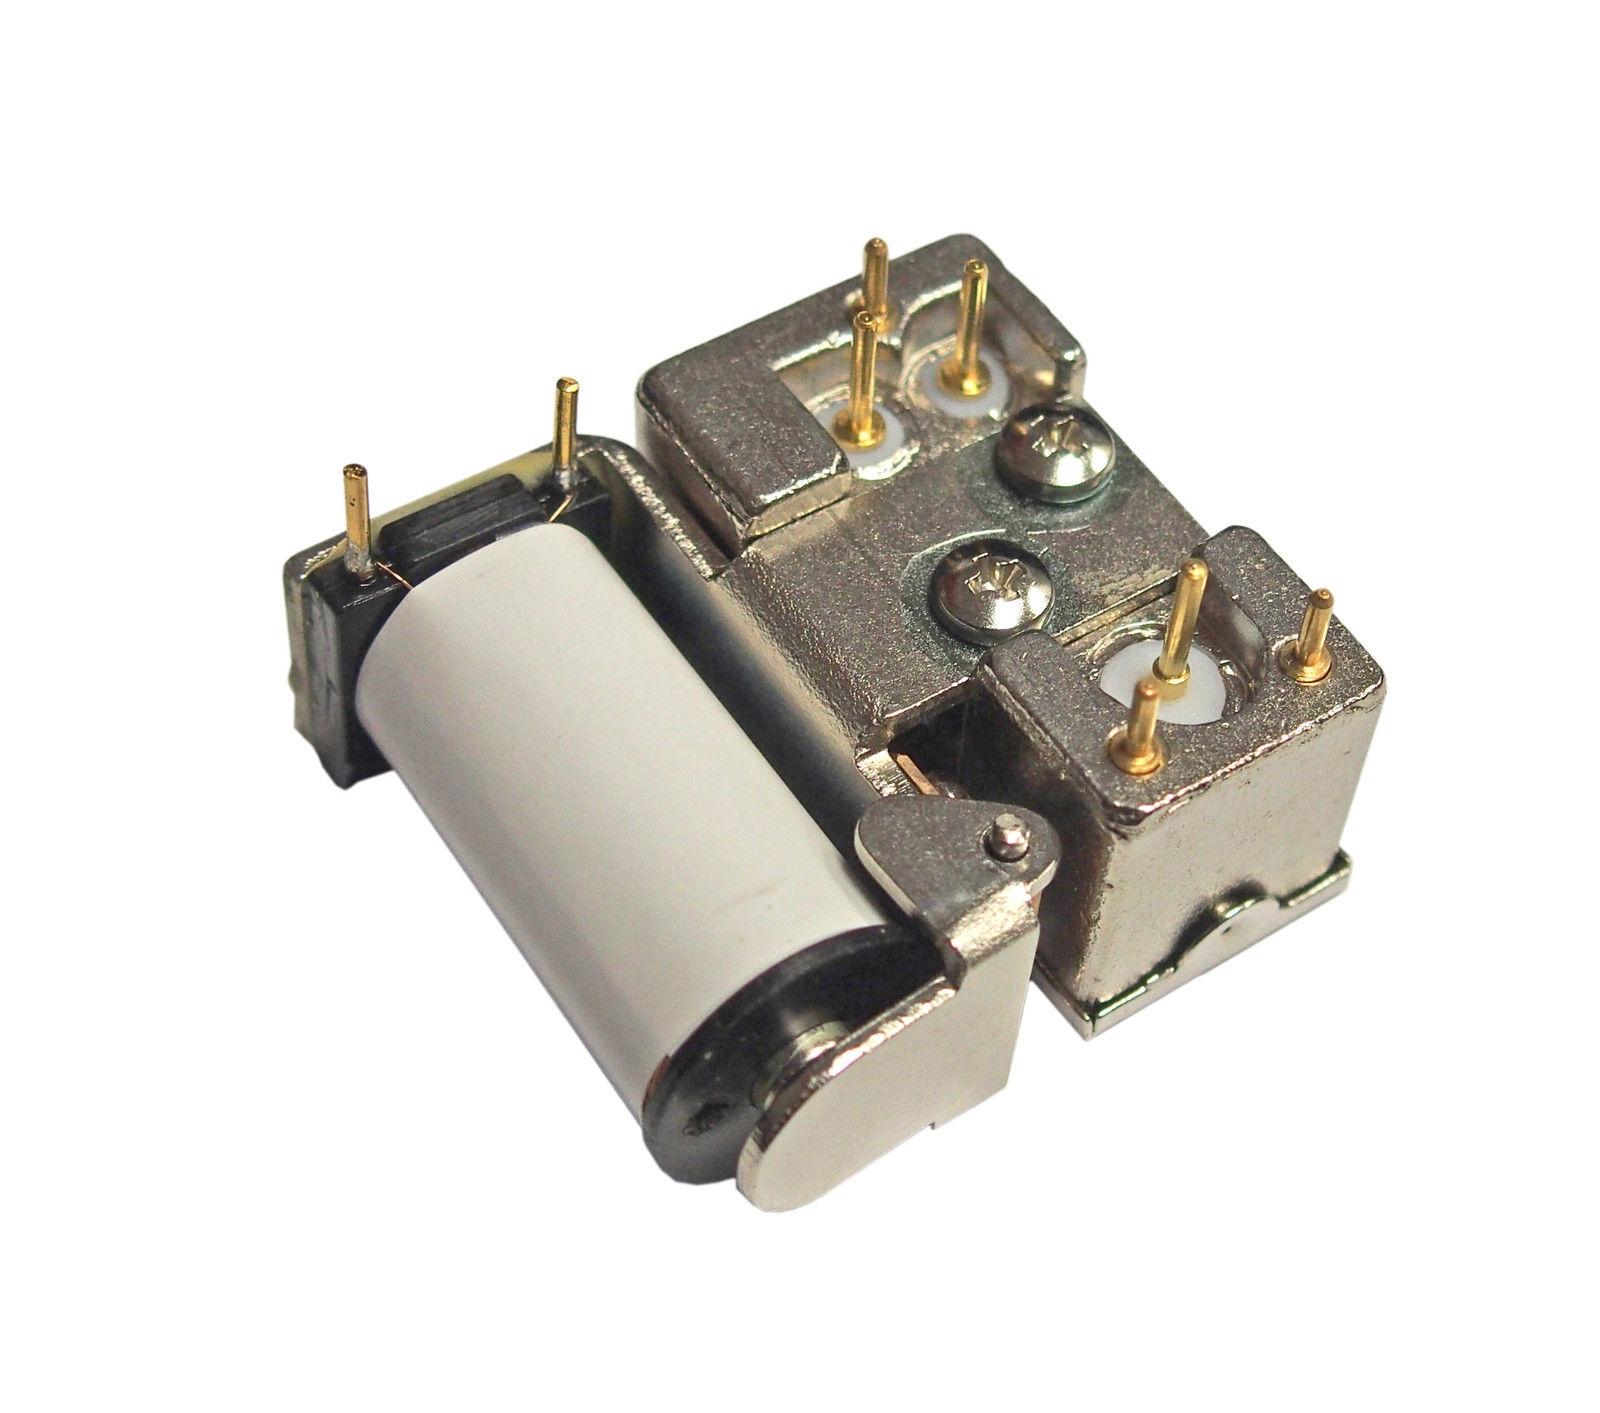 Tohtsu CX-120P coaxial relay - underside view